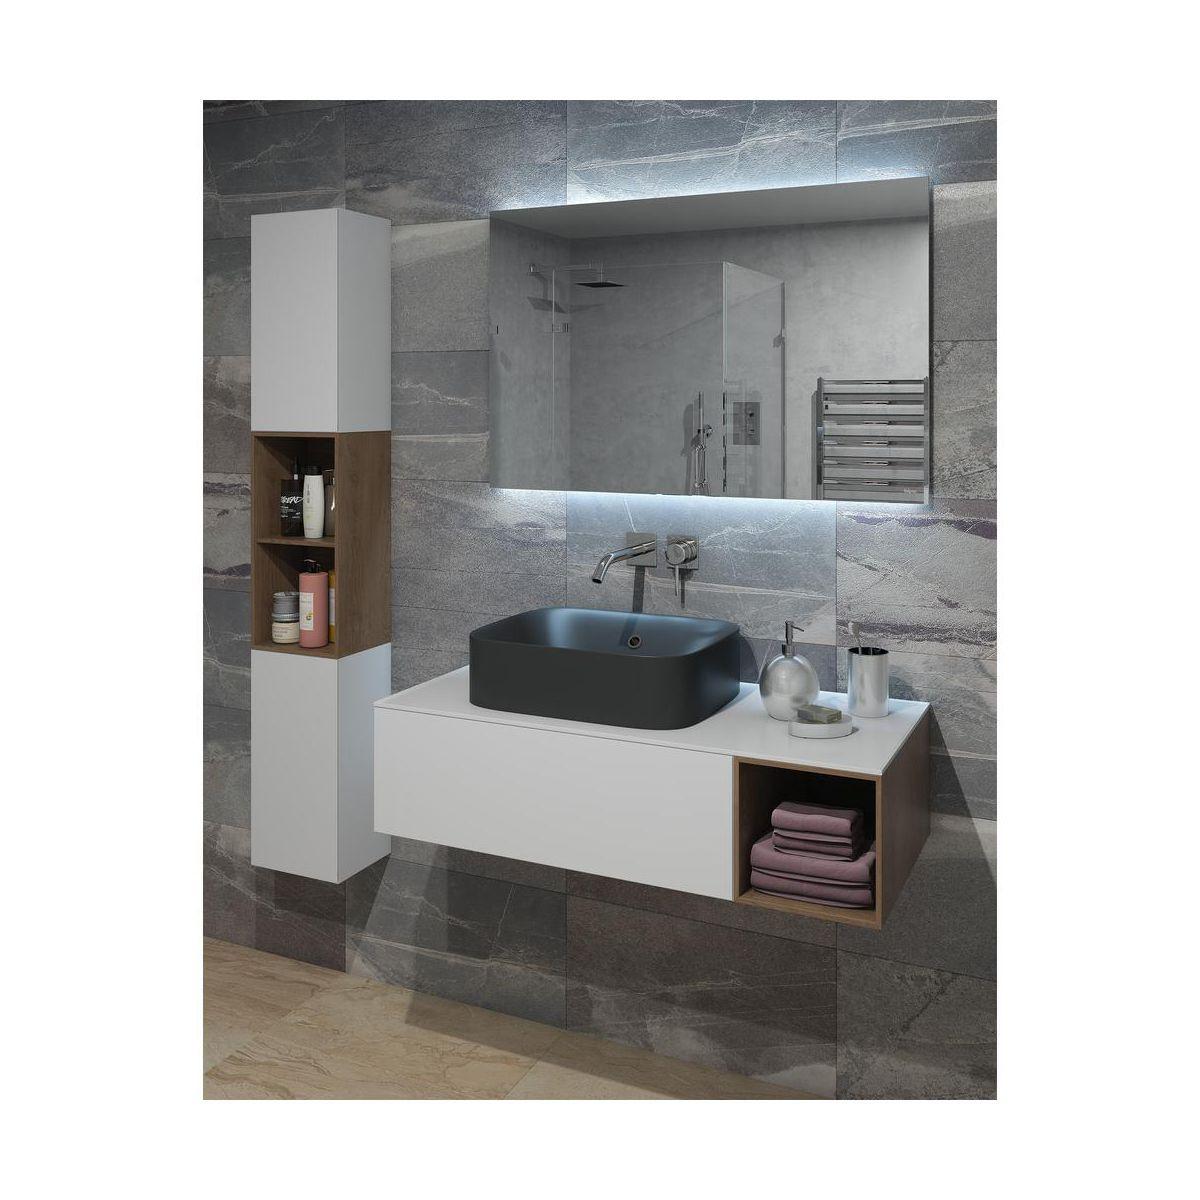 Umywalka Nablatowa Capsule Sensea Umywalki W Atrakcyjnej Cenie W Sklepach Leroy Merlin Lighted Bathroom Mirror Bathroom Mirror Bathroom Lighting